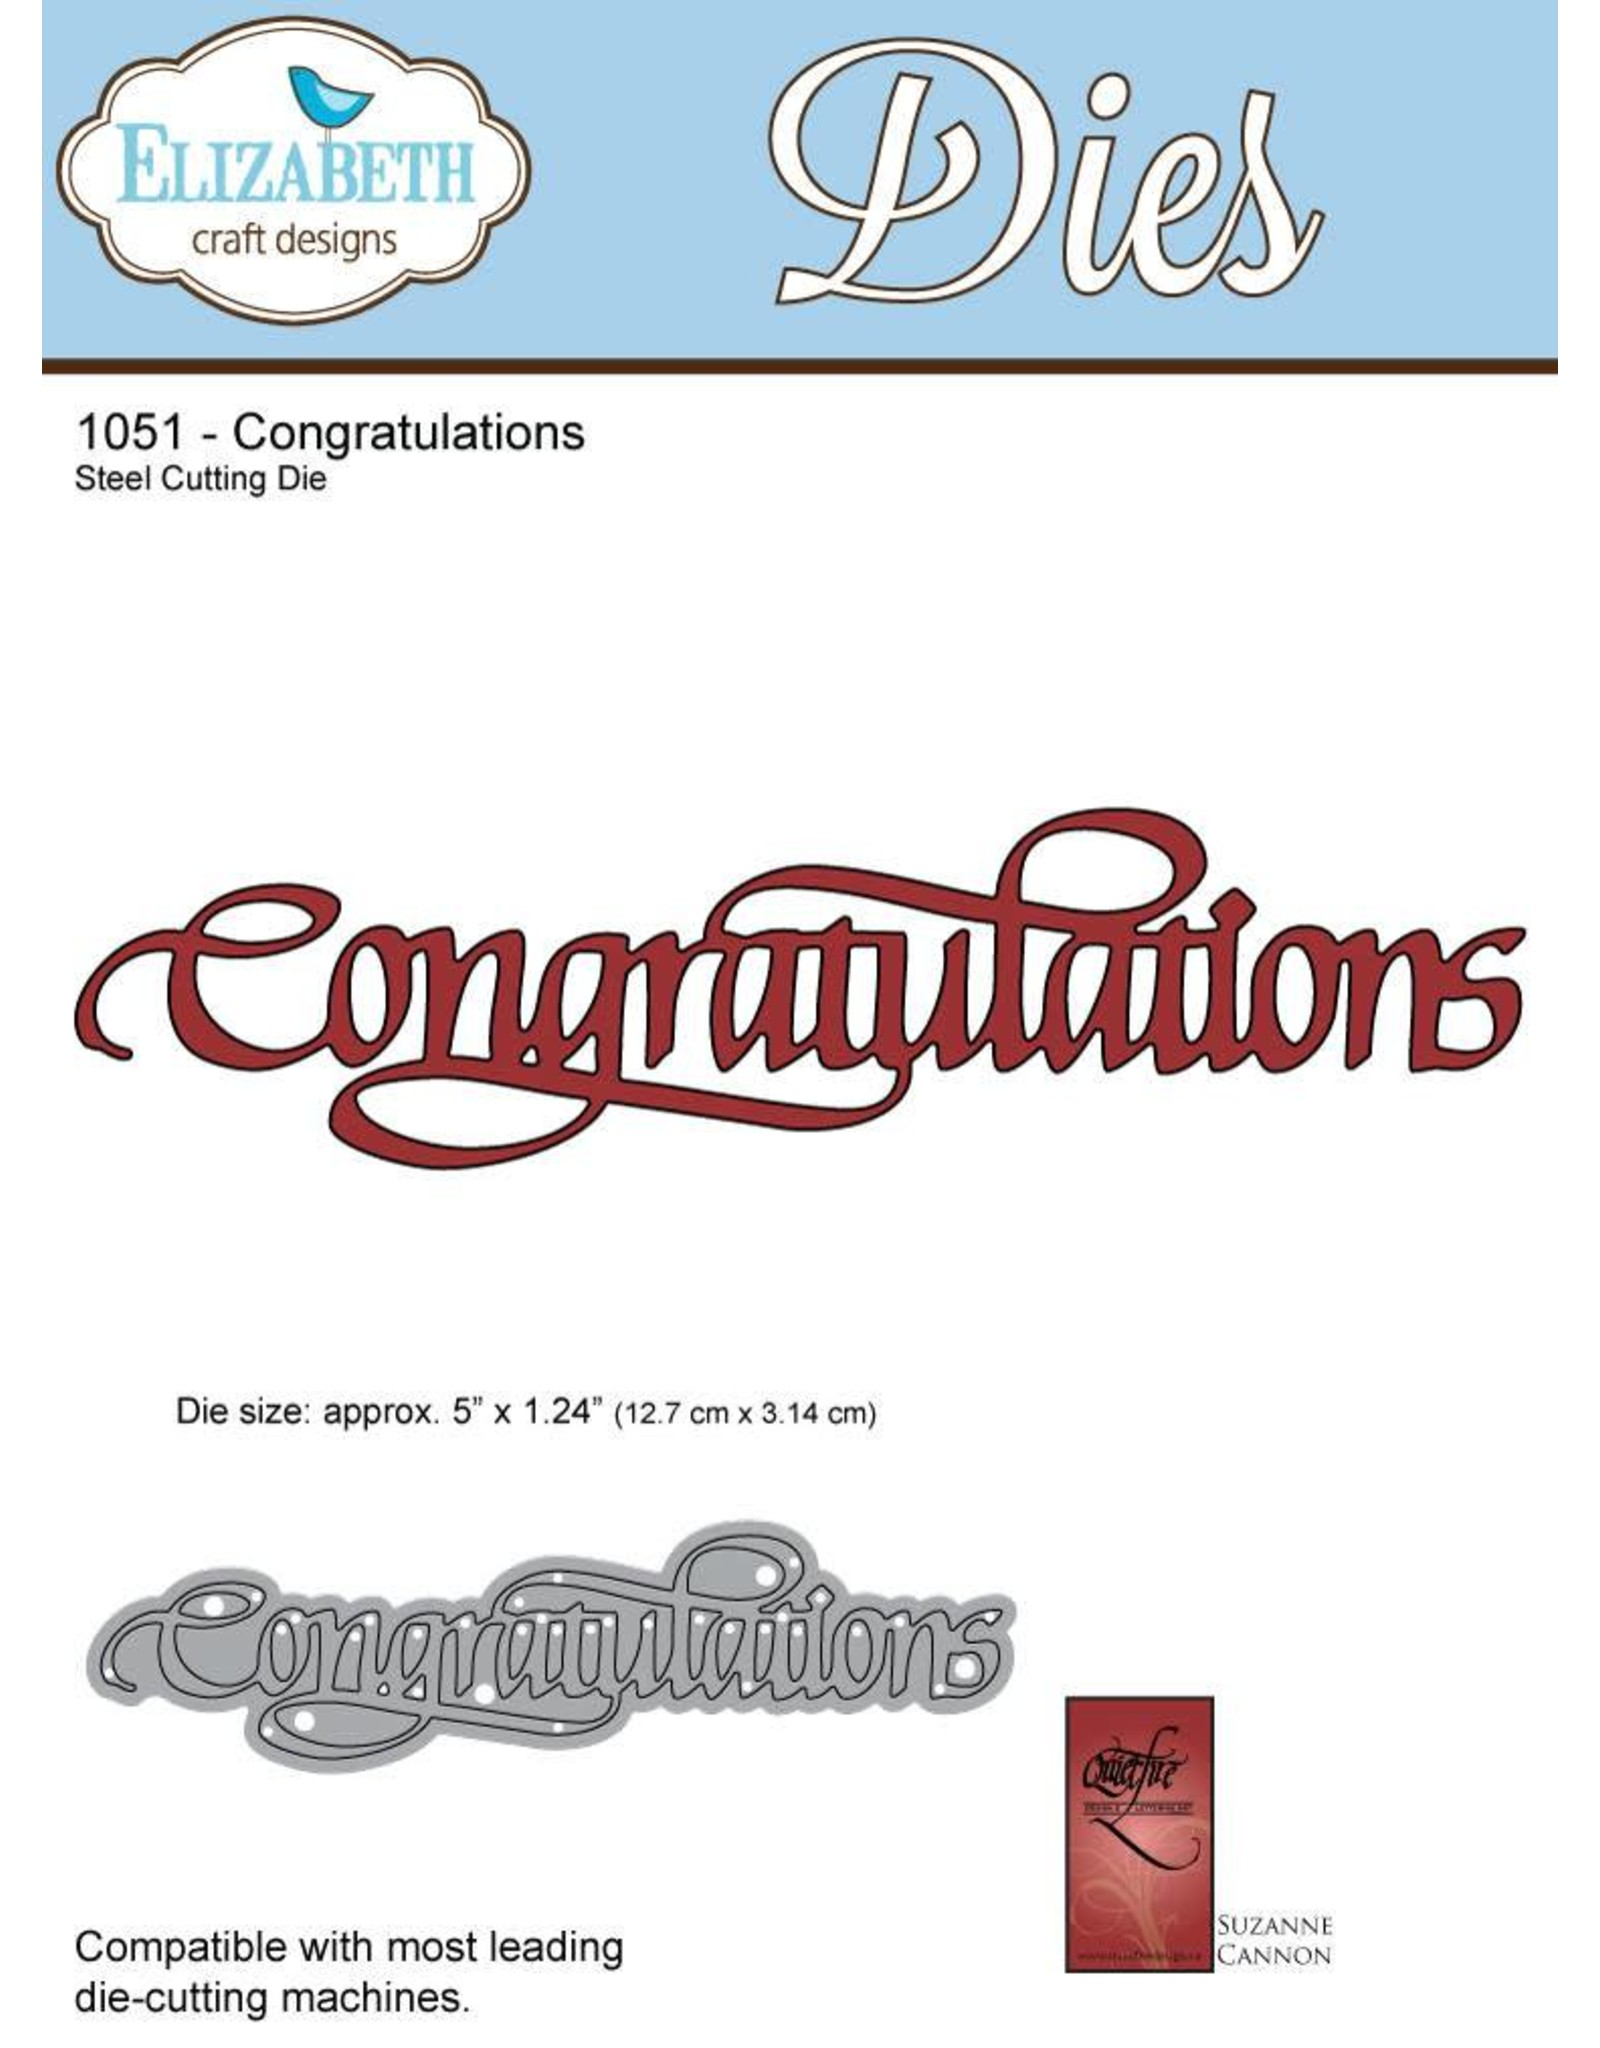 Elizabeth Craft Designs Elizabeth Craft Designs A Way With Words, Congratulations 1051